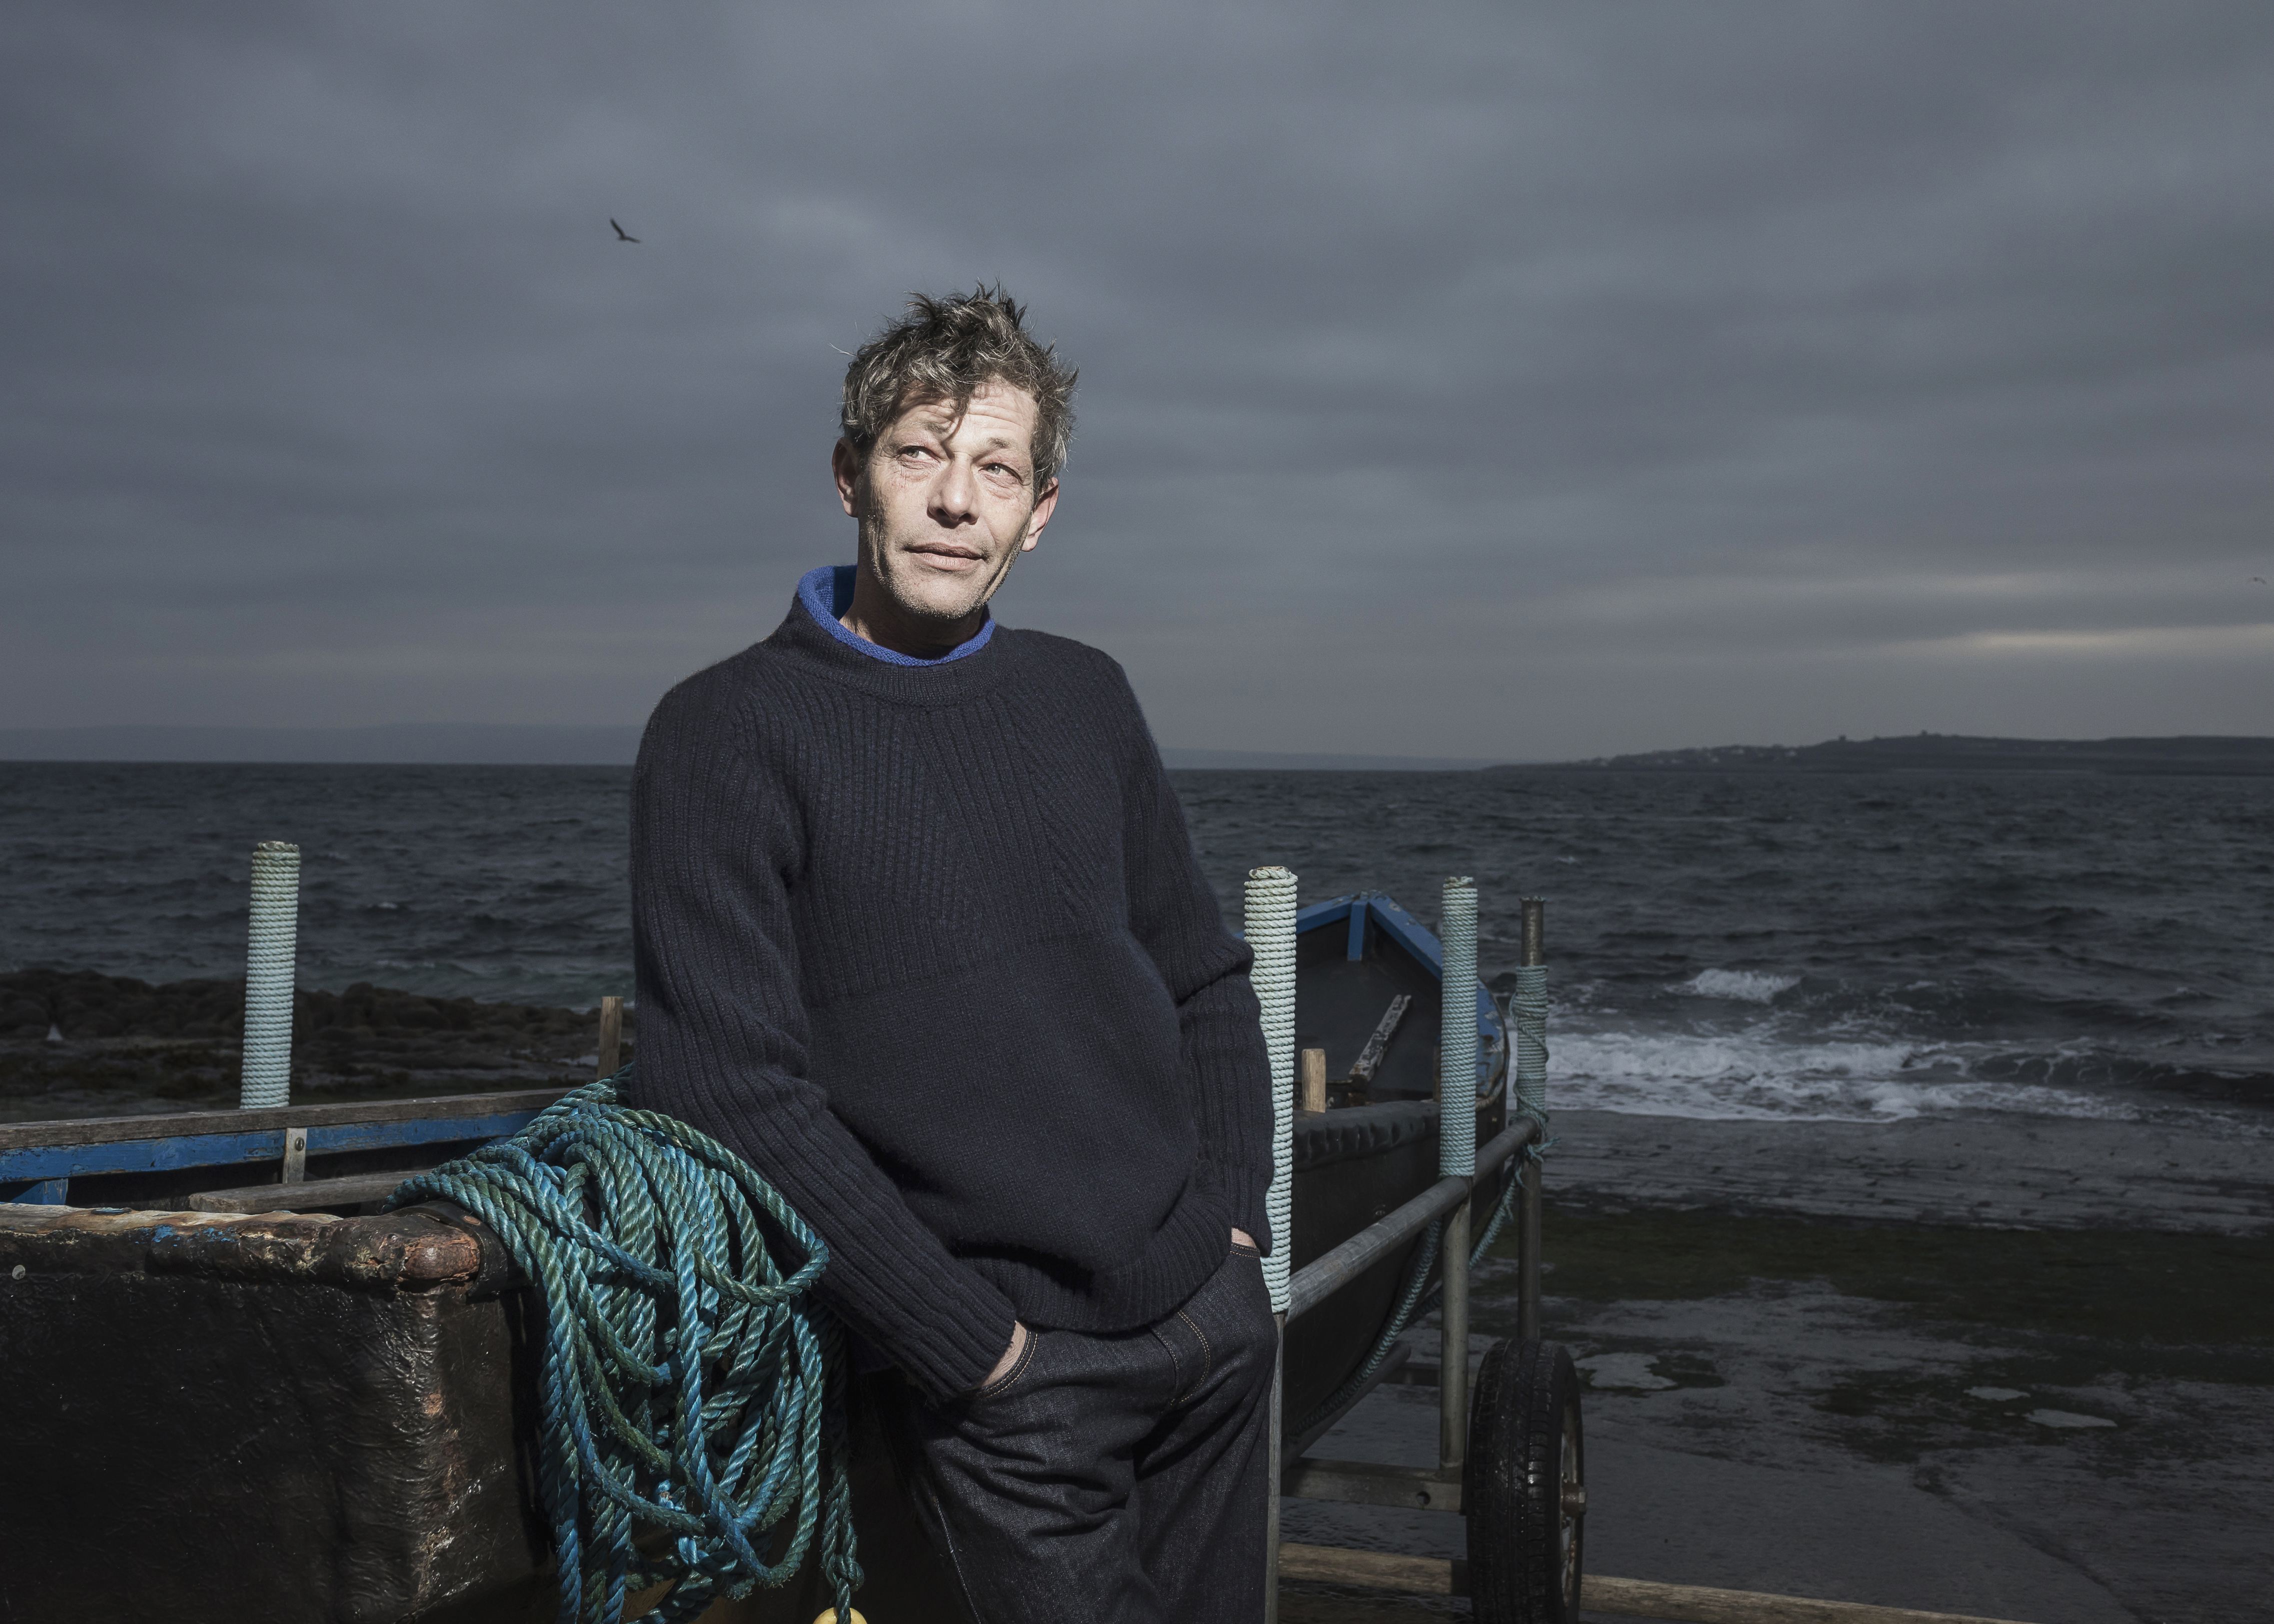 New Aran Fisherman Sweater